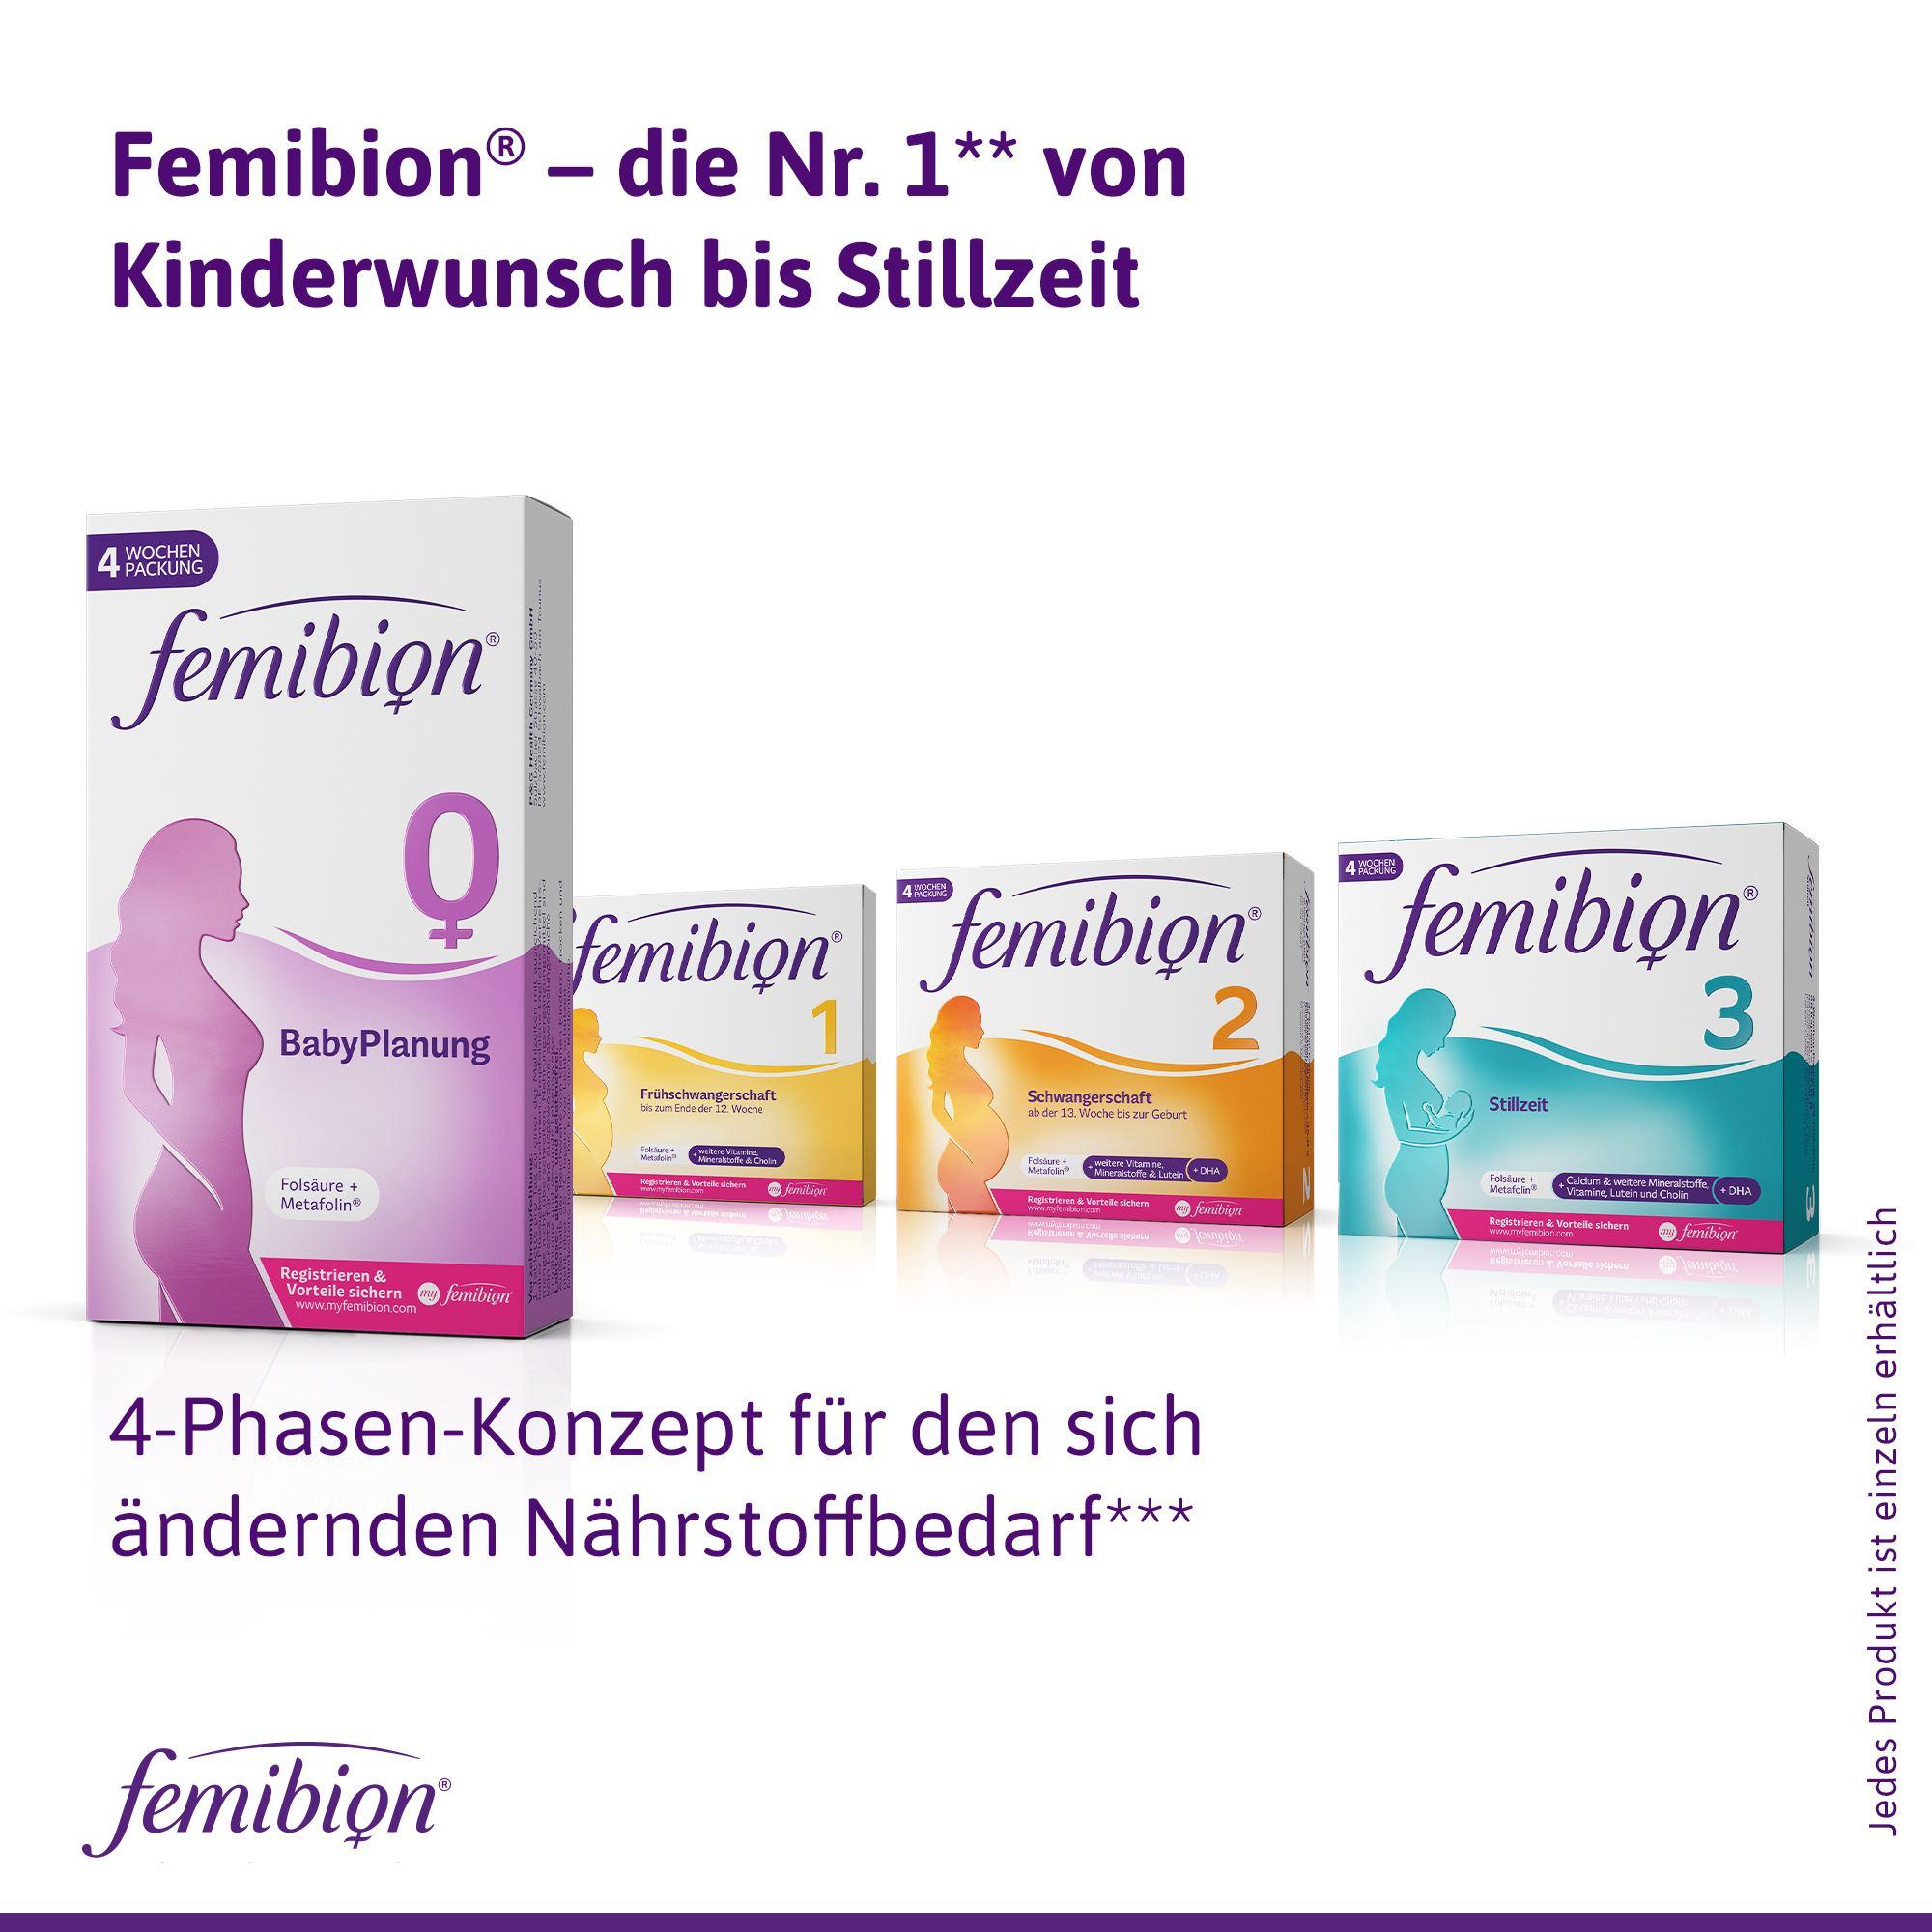 Femibion Produktrange